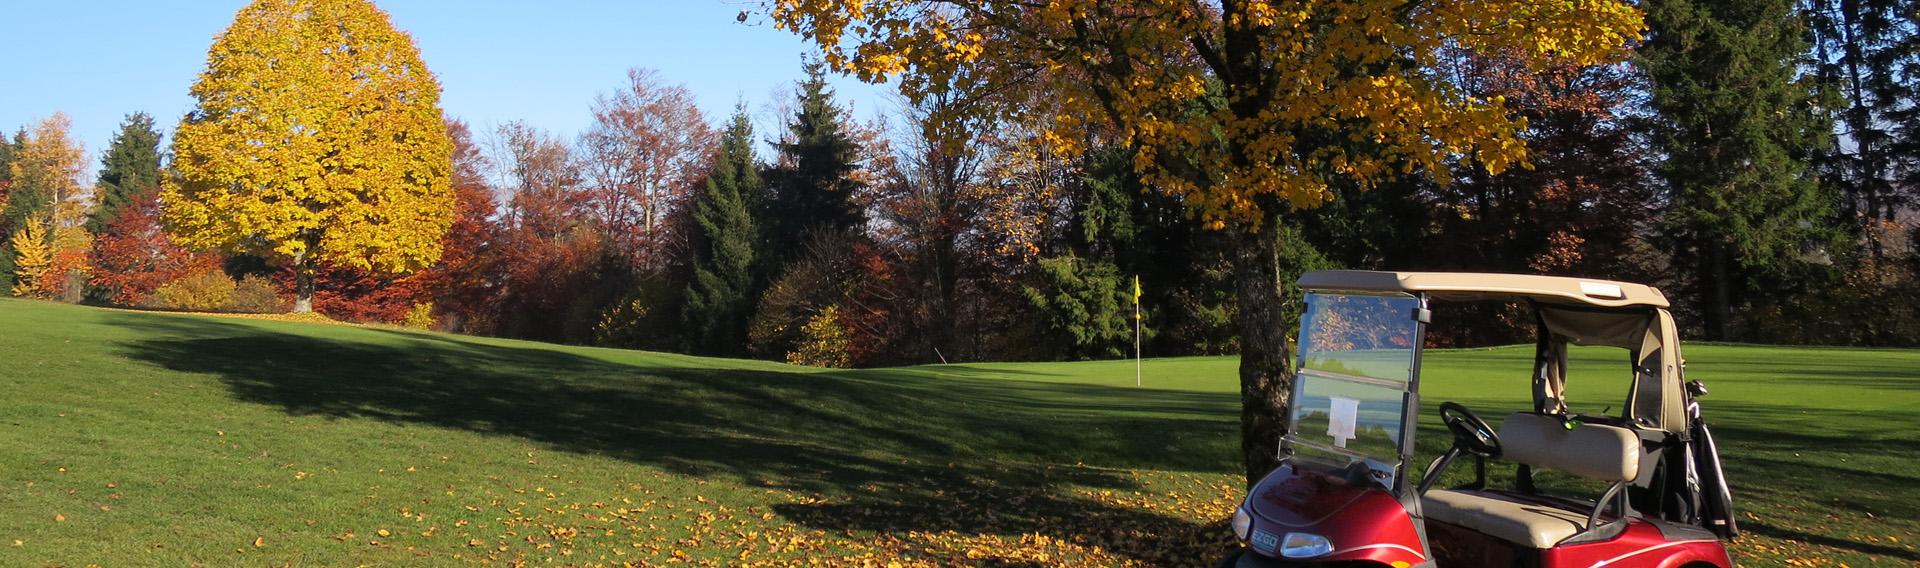 Golfclub_Rickenbach_Home_1